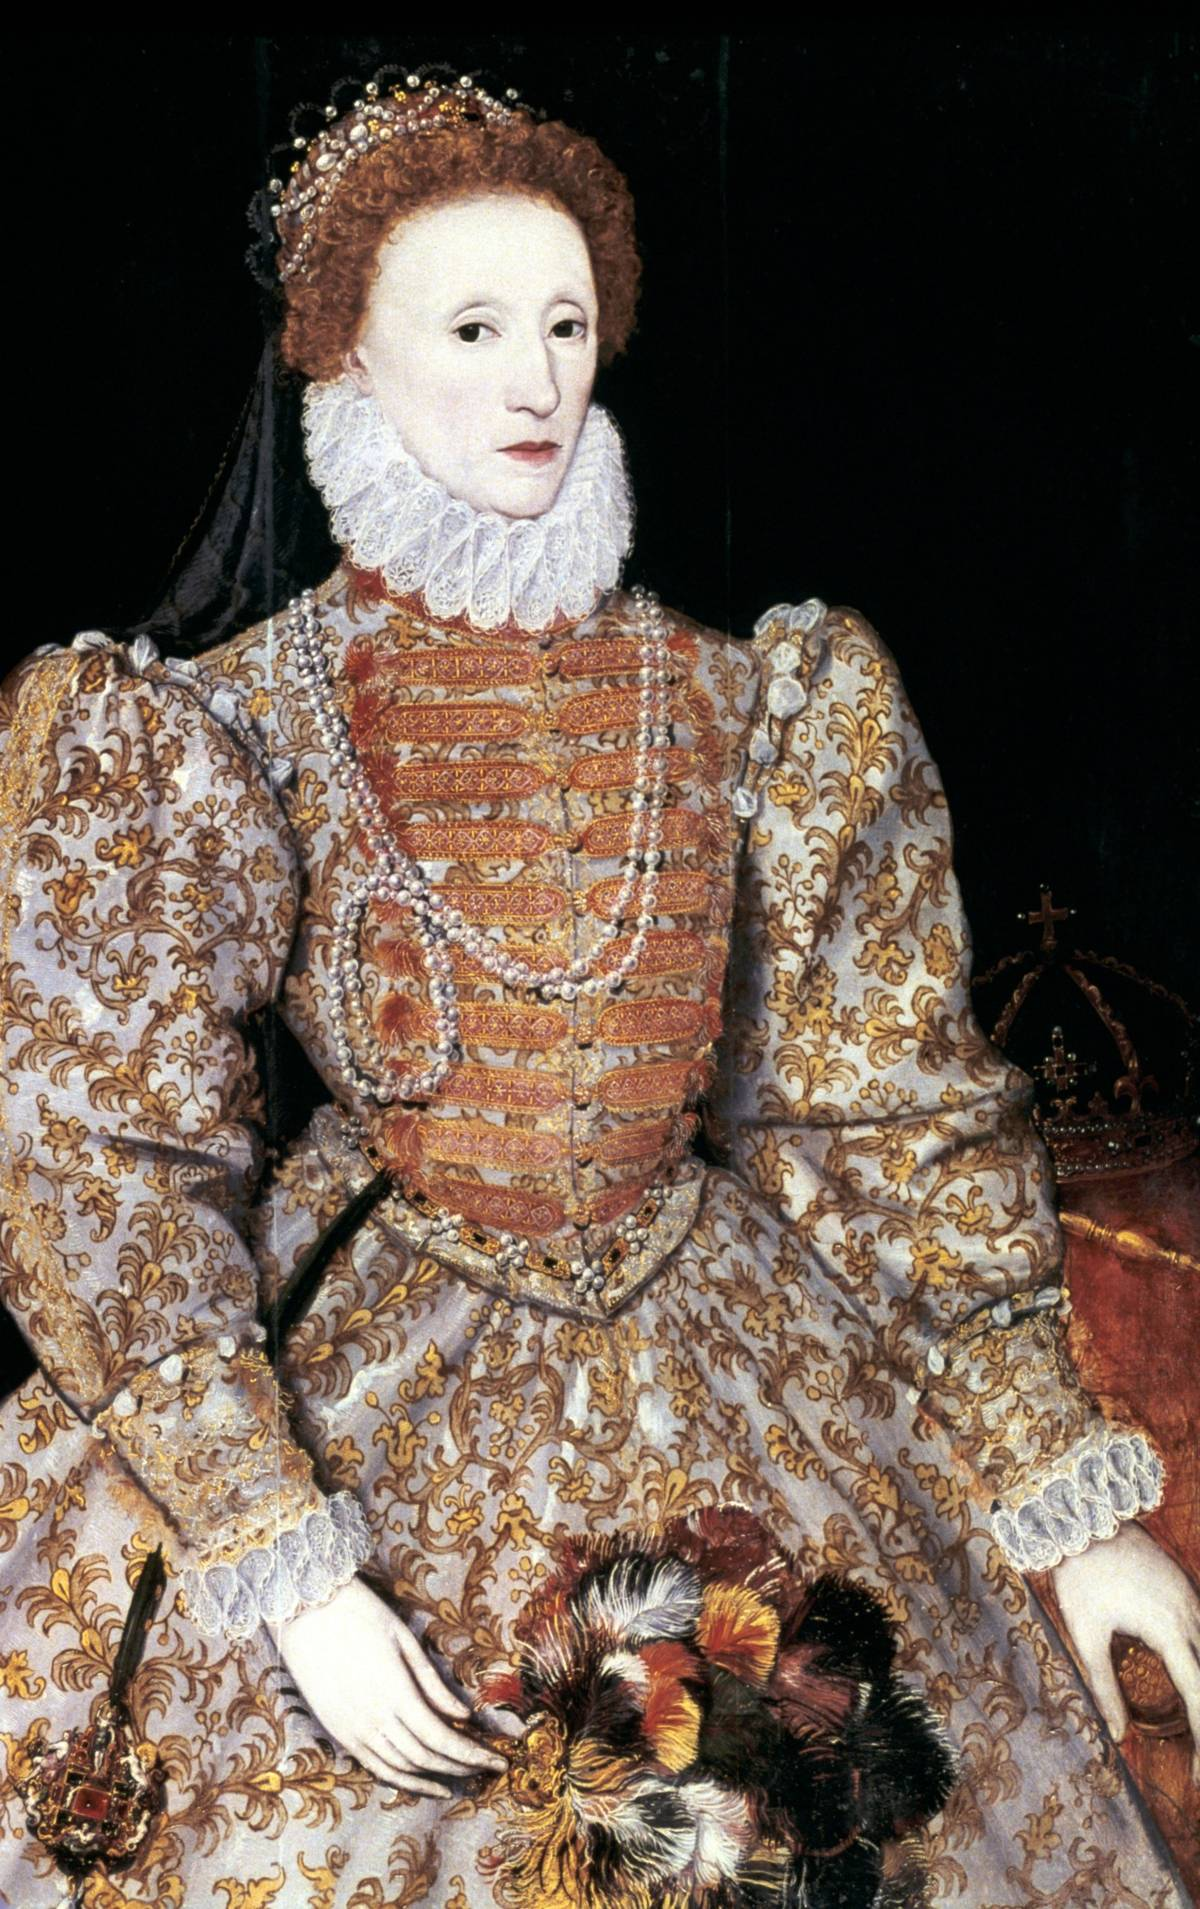 Womens clothing elizabethan era clipart image free Oddly Astonishing Examples of Clothing in the Elizabethan Era image free